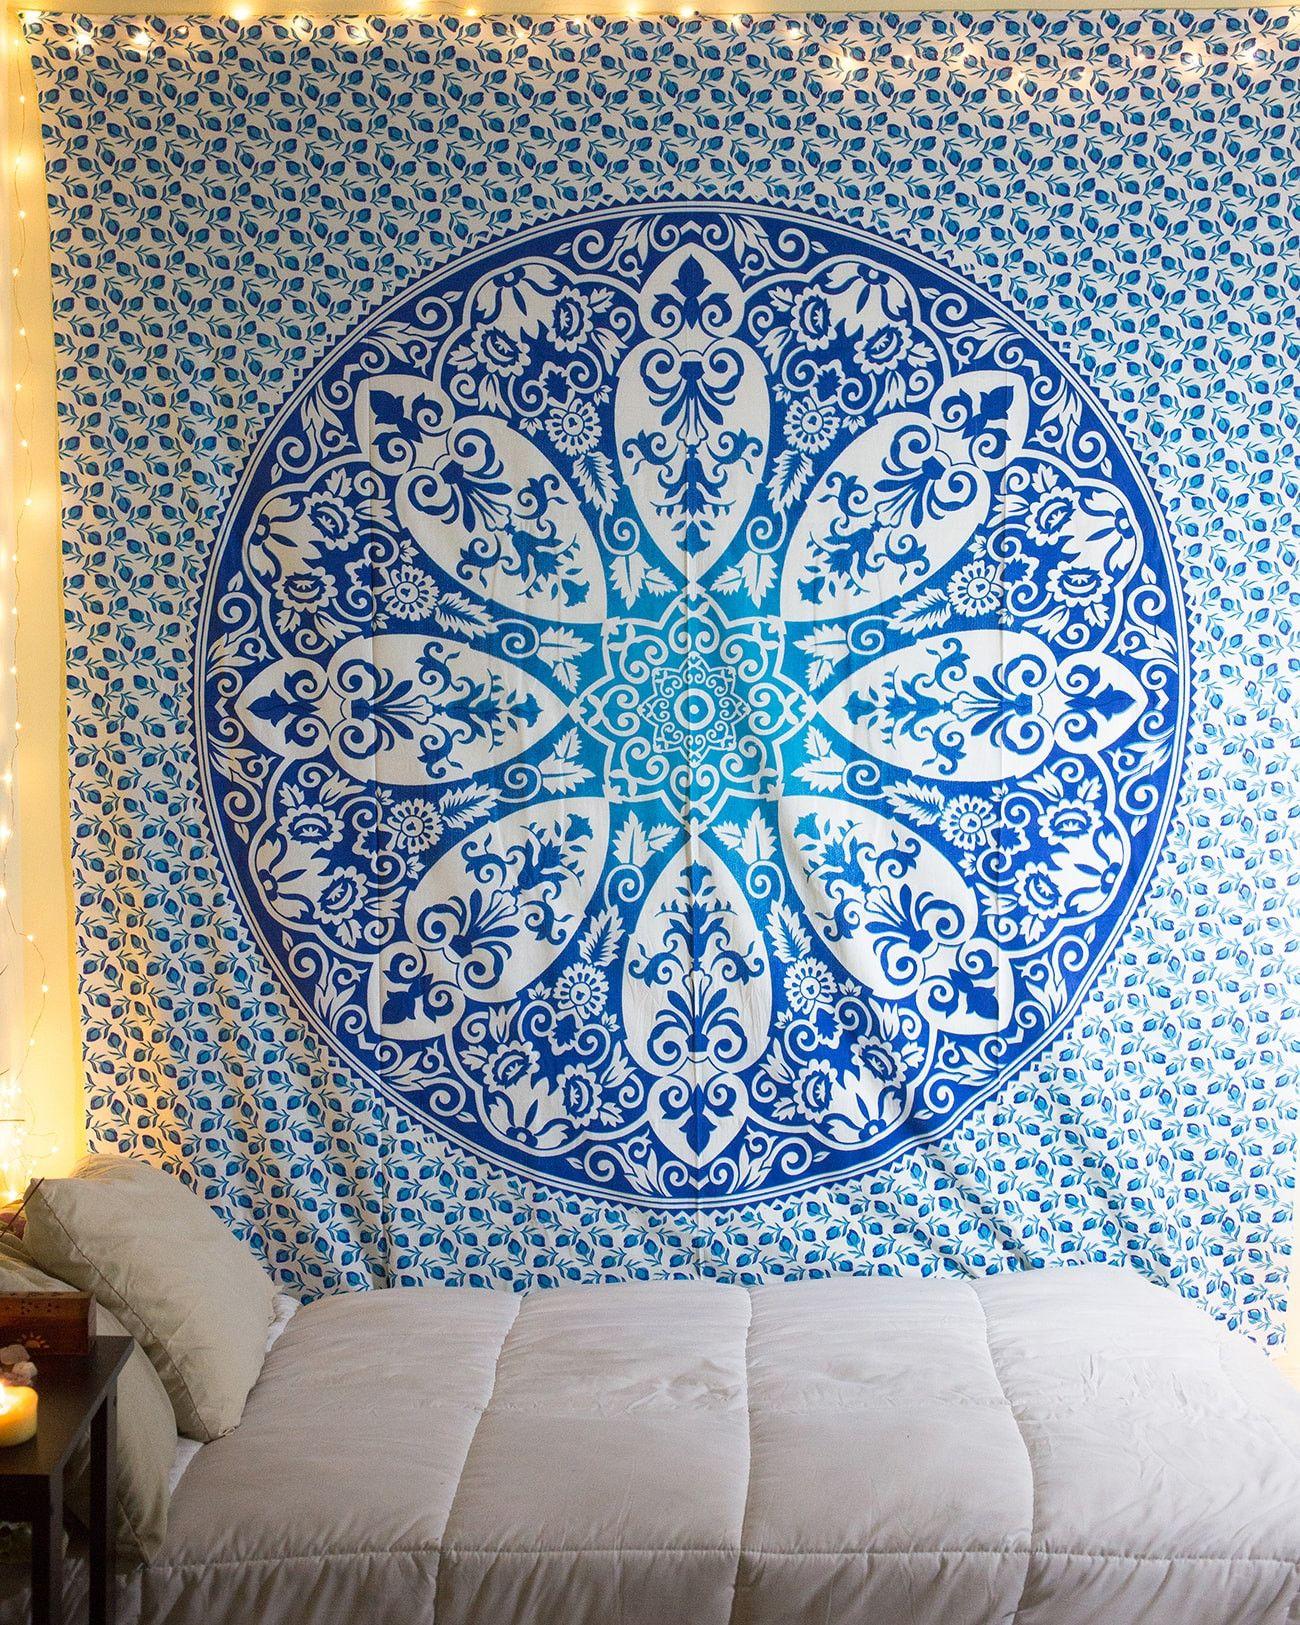 Blue Boho Tapestry From Thebohemianshop.com